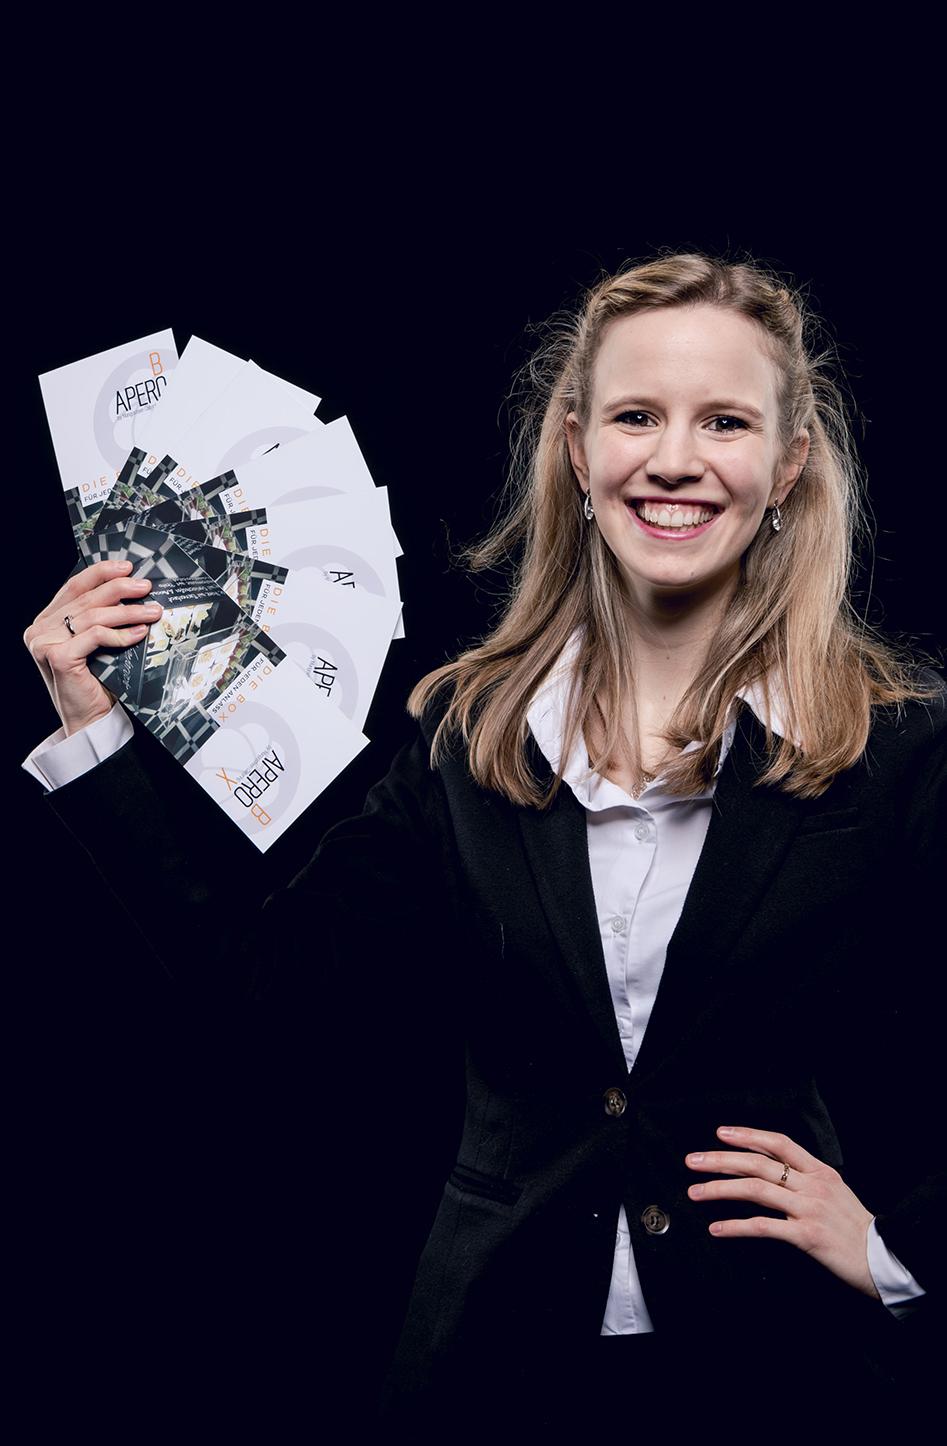 Mangosteen Catering - Céline Vollrath, Catering Supervisor